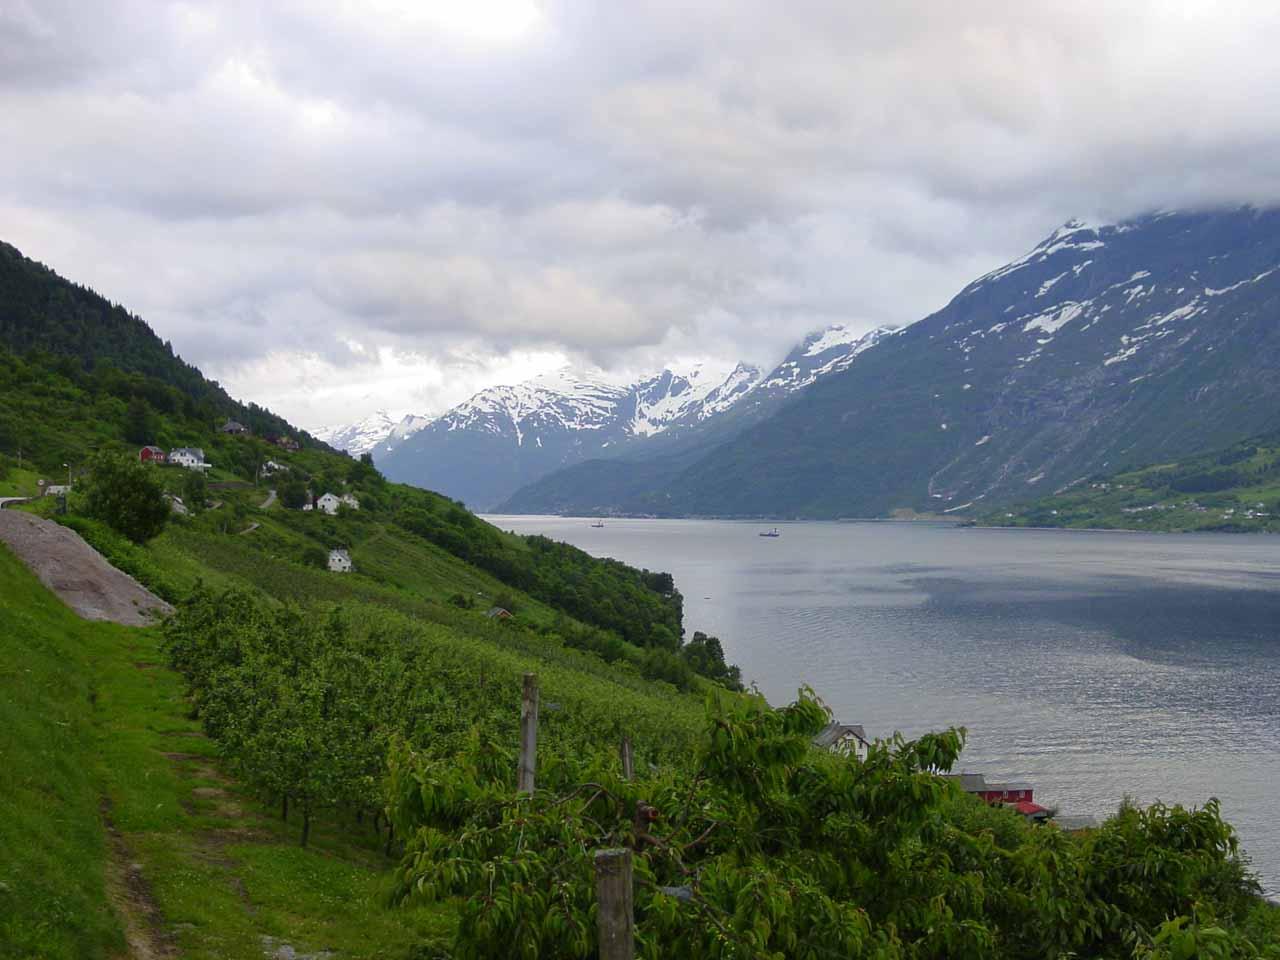 Looking along the eastern shore of Sørfjorden as we were headed to Ullensvang from Kinsarvik